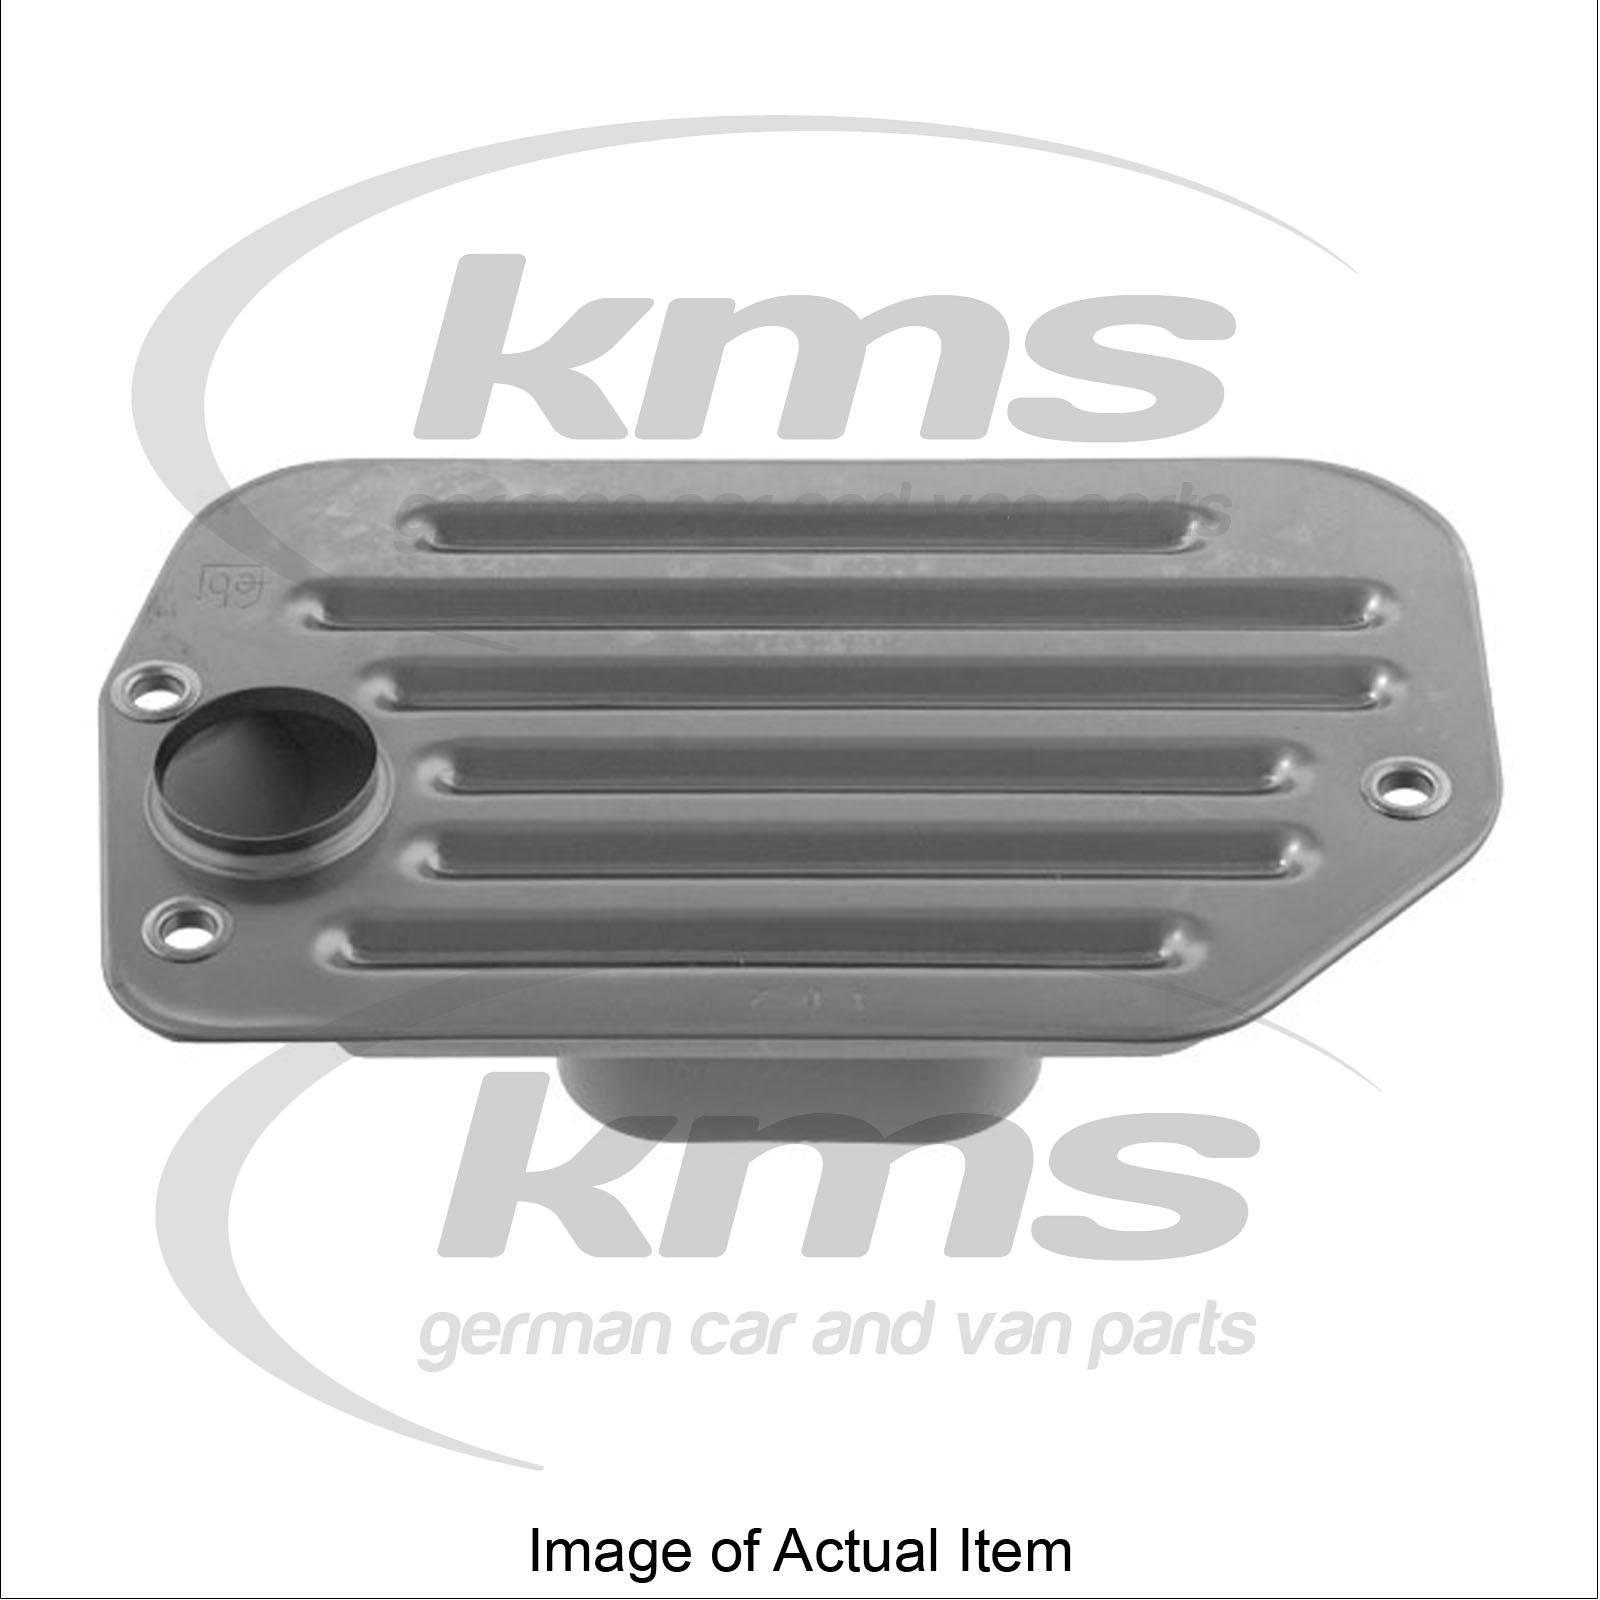 Transmission oil strainer audi a6 estate avant quattro c4 for Audi a6 motor oil